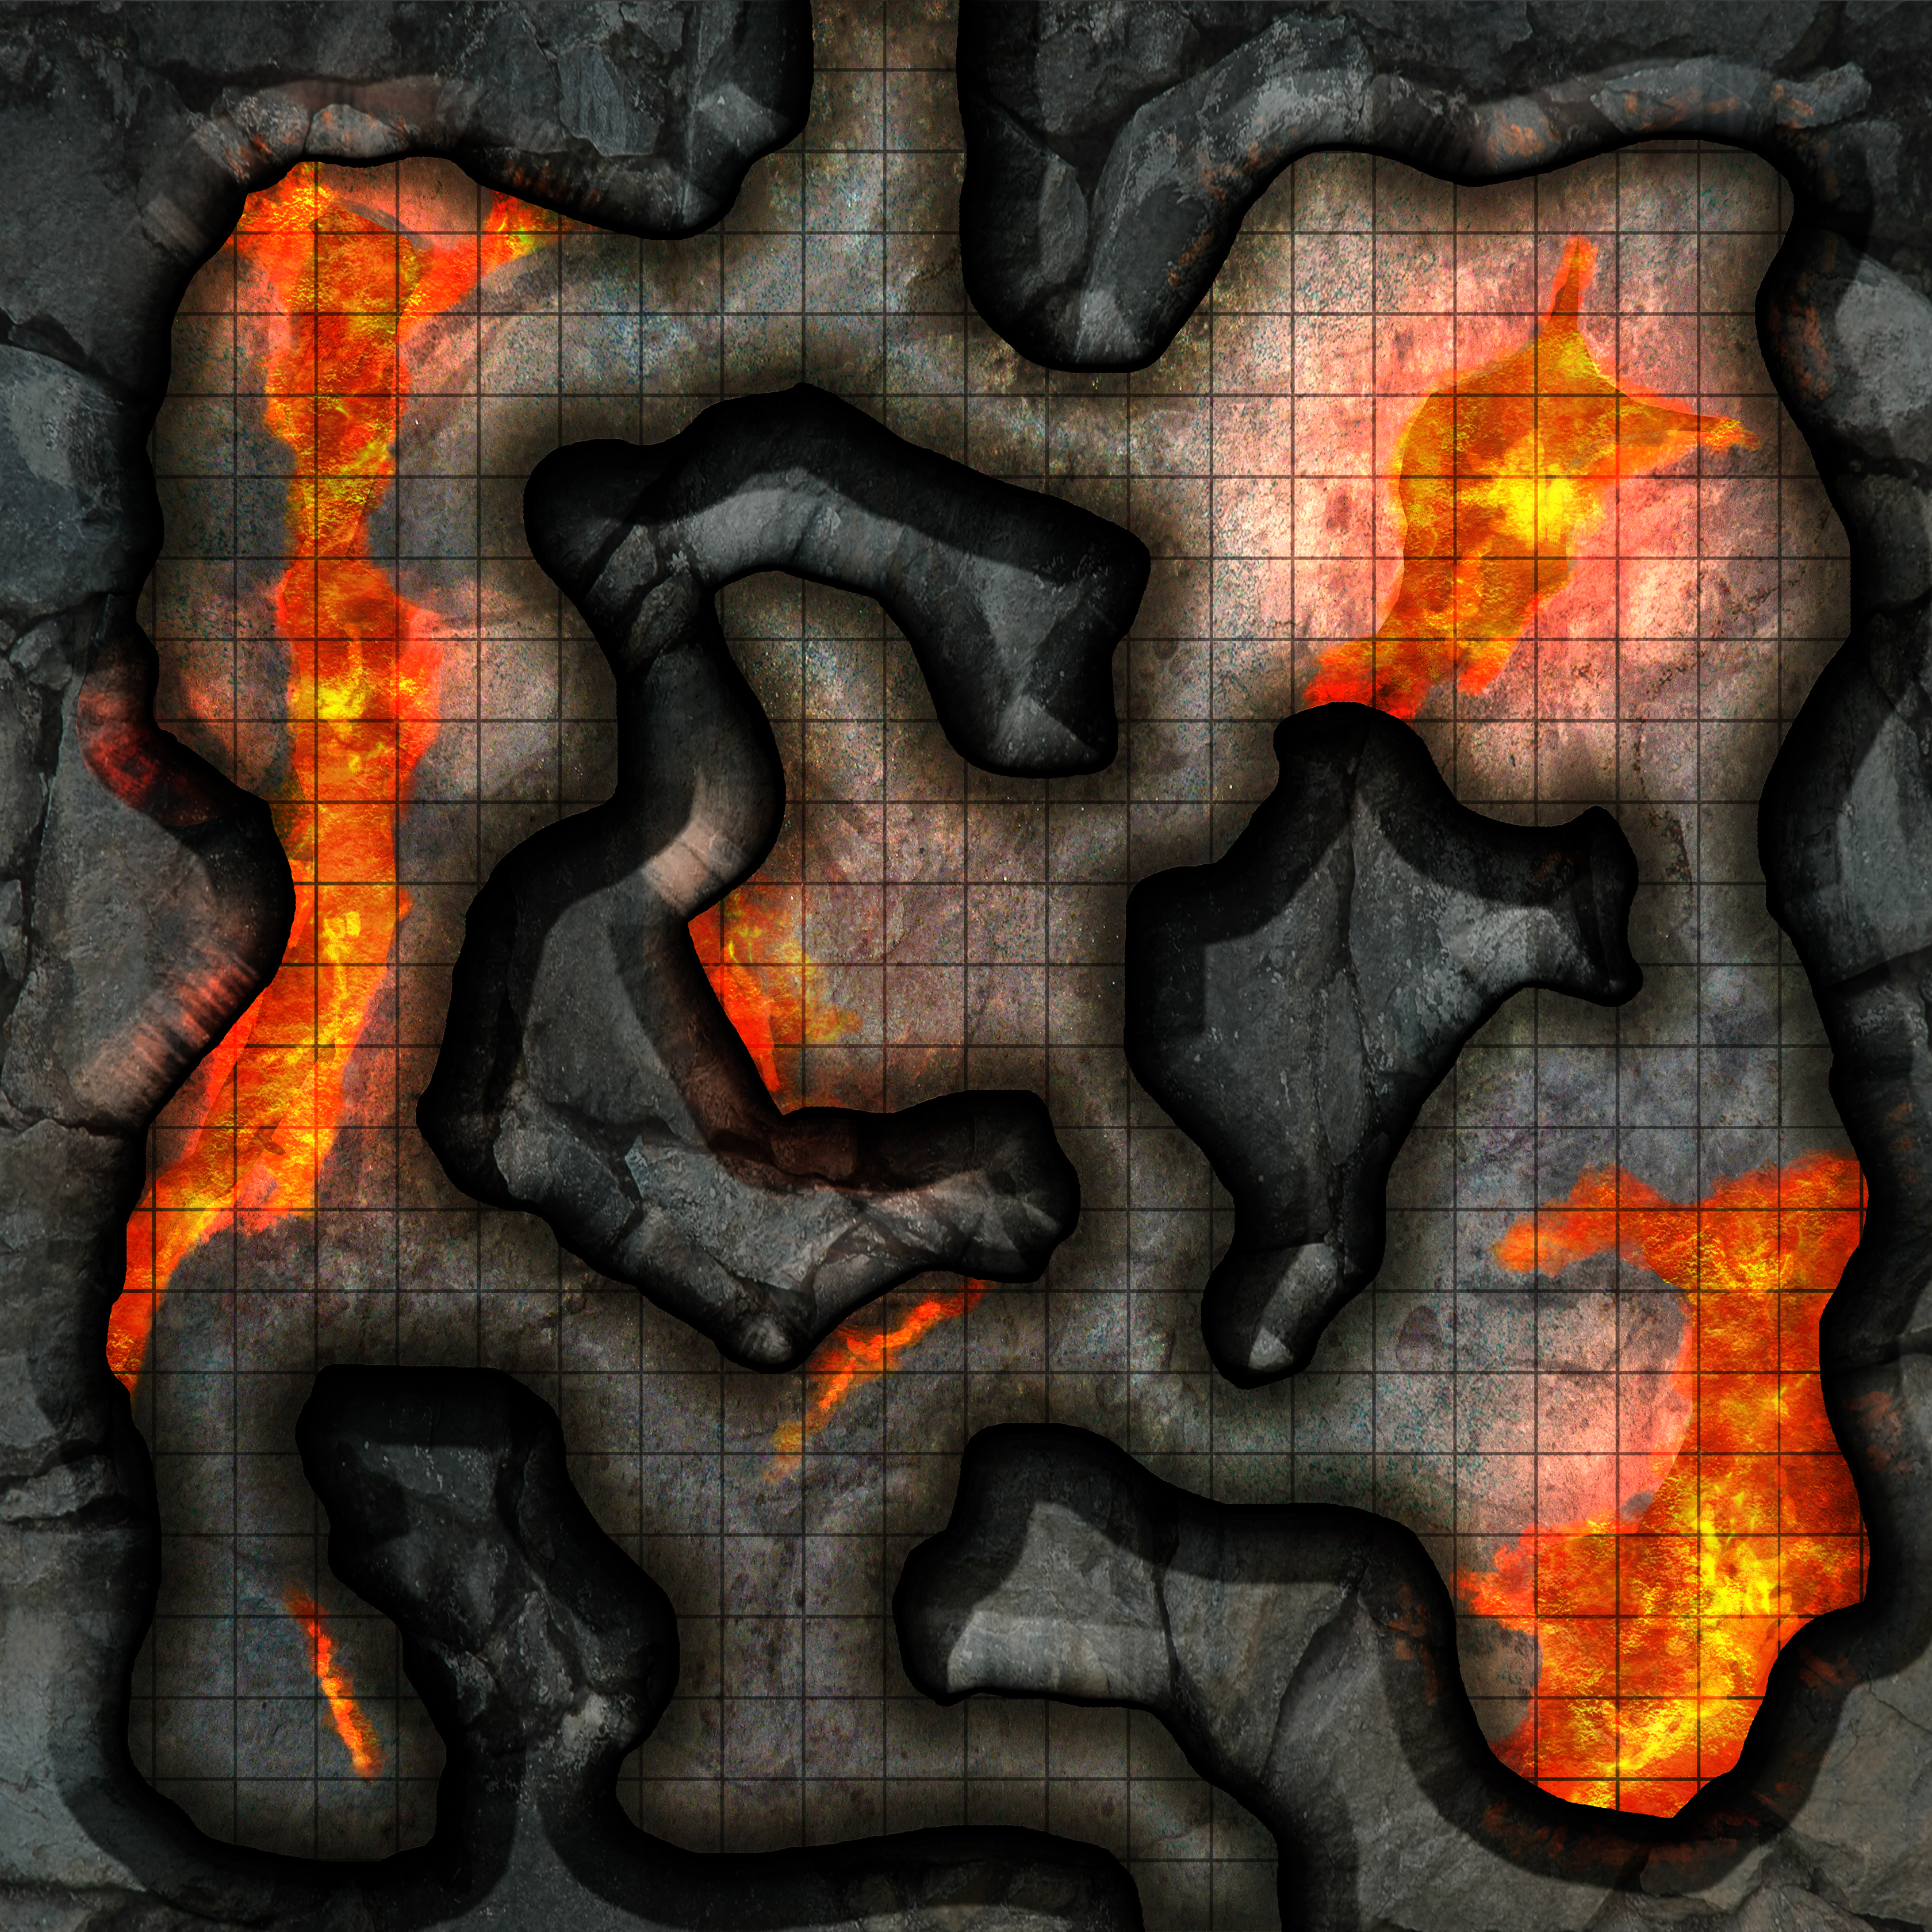 Lava_Cave_24x24_1_Square_-_VTT.jpg